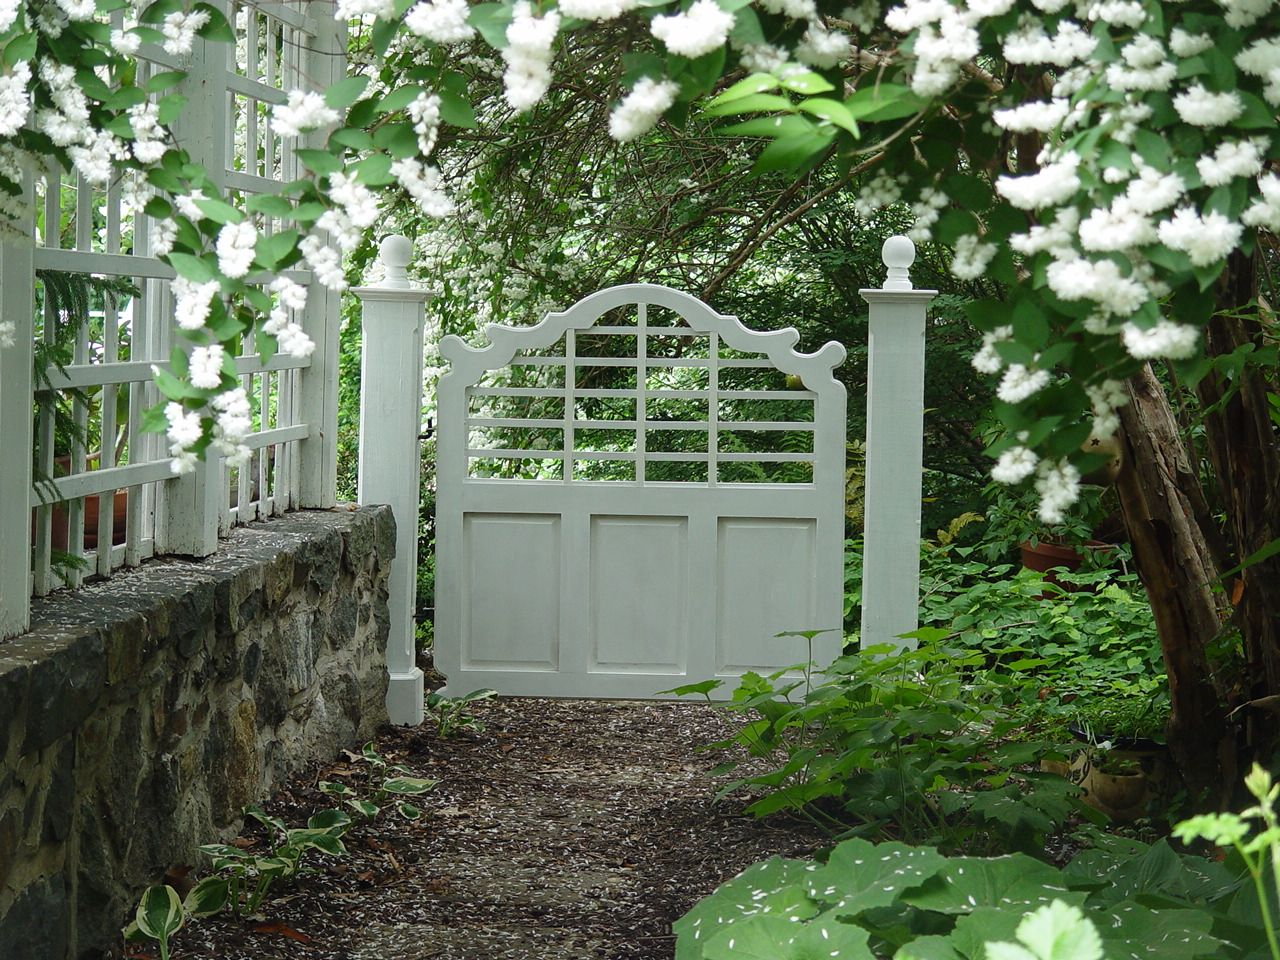 Lutyens Garden Gate Create By The Graceful Gates Company